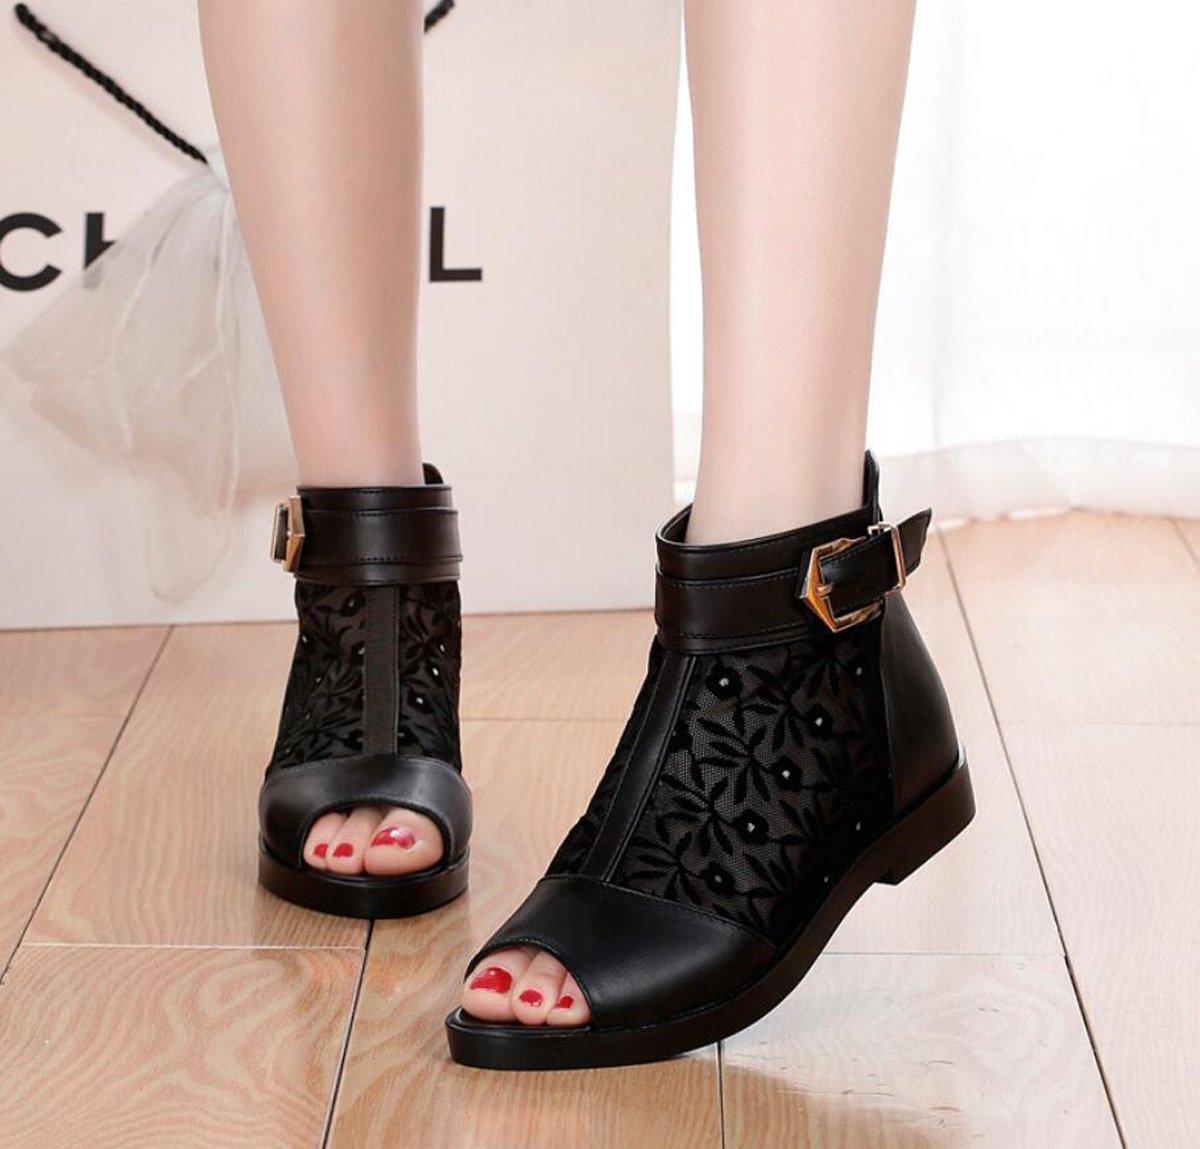 DANDANJIE Frauen Sandalen Stiefel Sommer Mesh Mesh Mesh Hohl Offene Spitze Comfort Outdoor Sandalen Niedrige Ferse Bequeme Schuhe (Farbe   Schwarz Größe   36) 6912f5